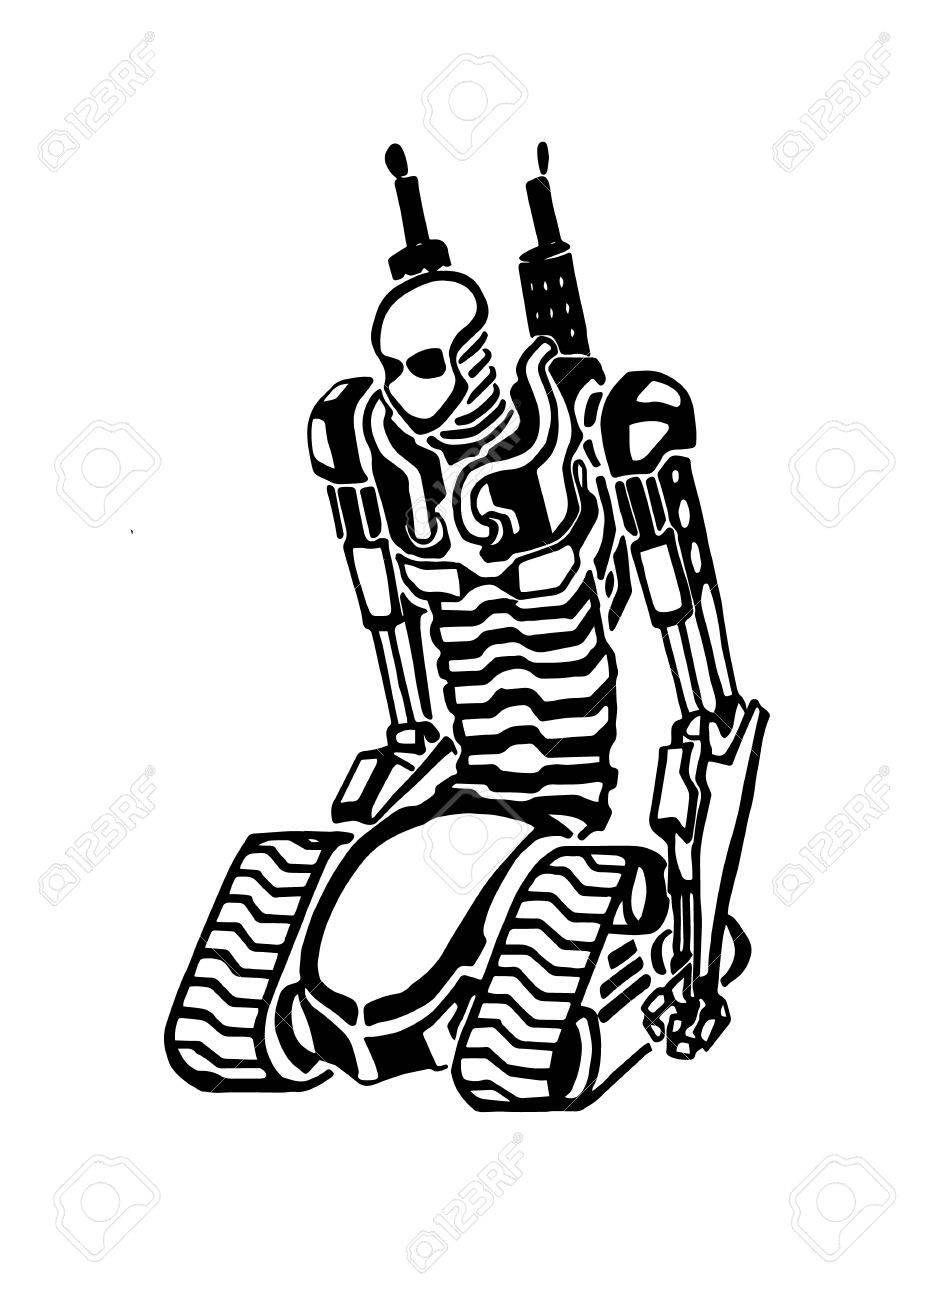 949x1300 Sketch Creative Robot. Vector Illustration Of Unusual